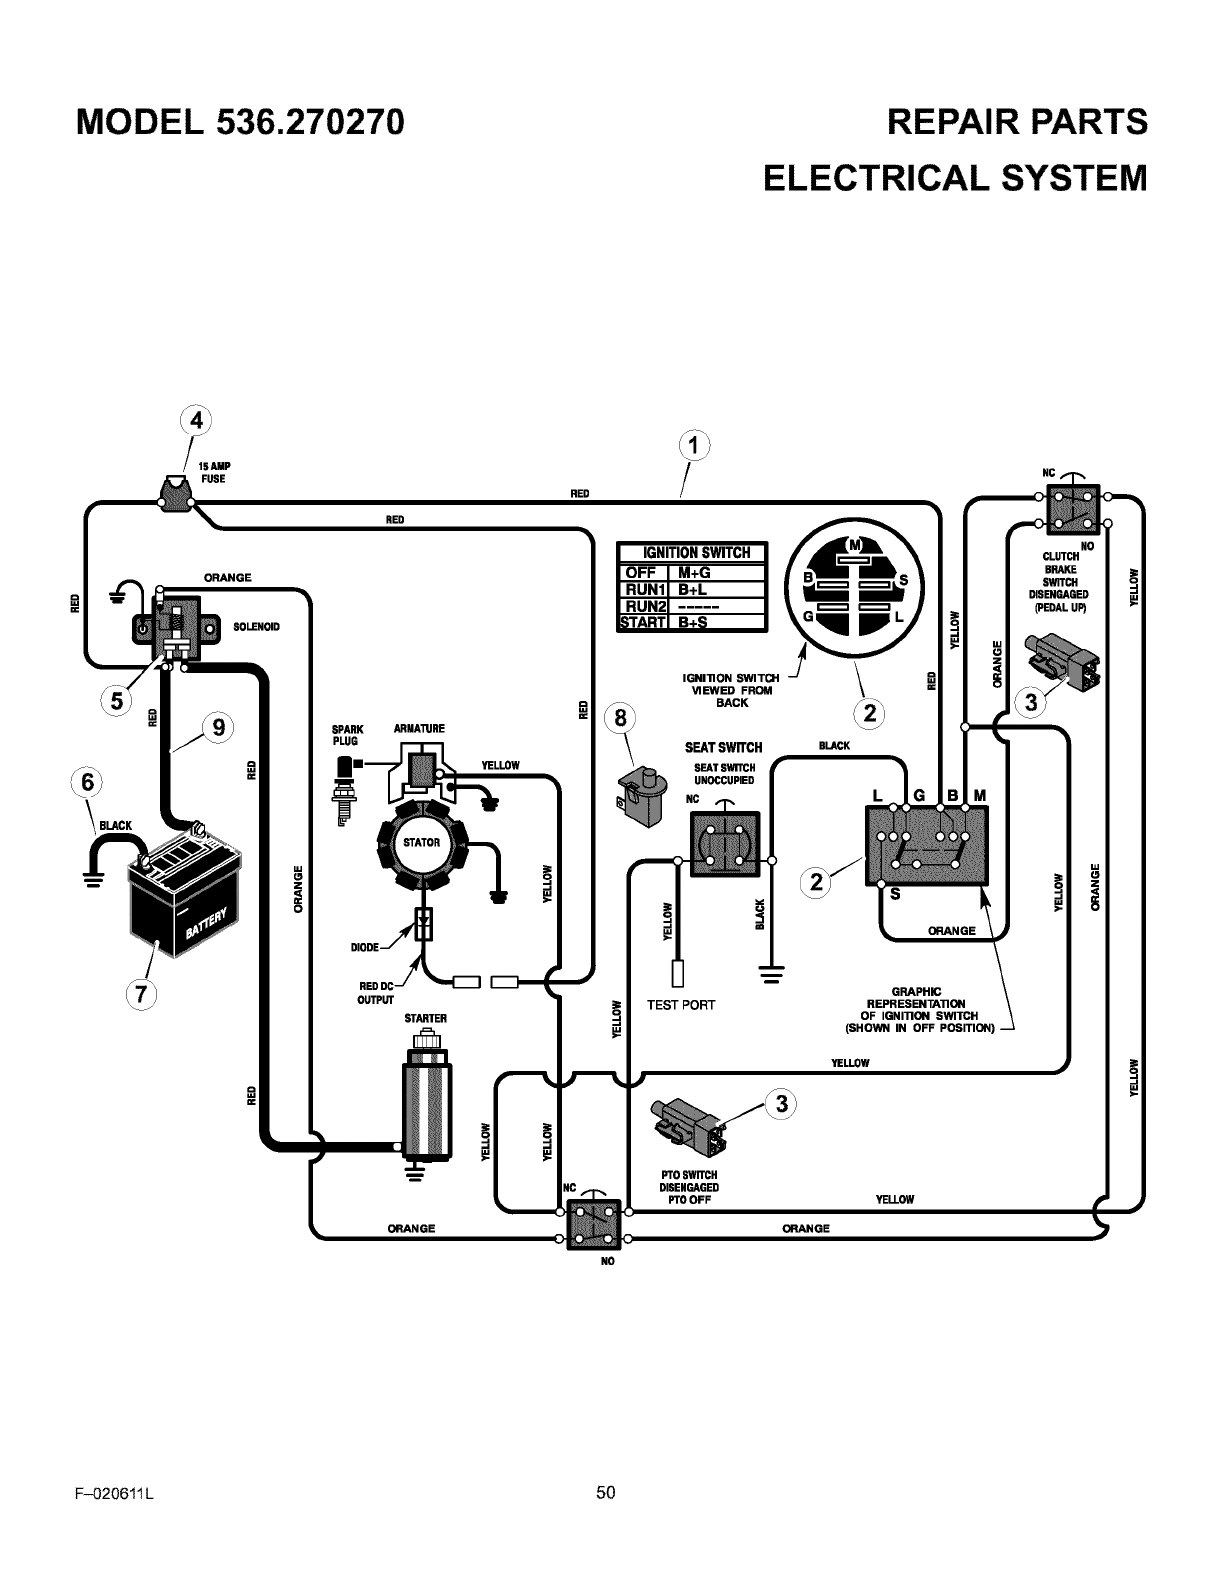 Craftsman User Manual Riding Mower Manuals And